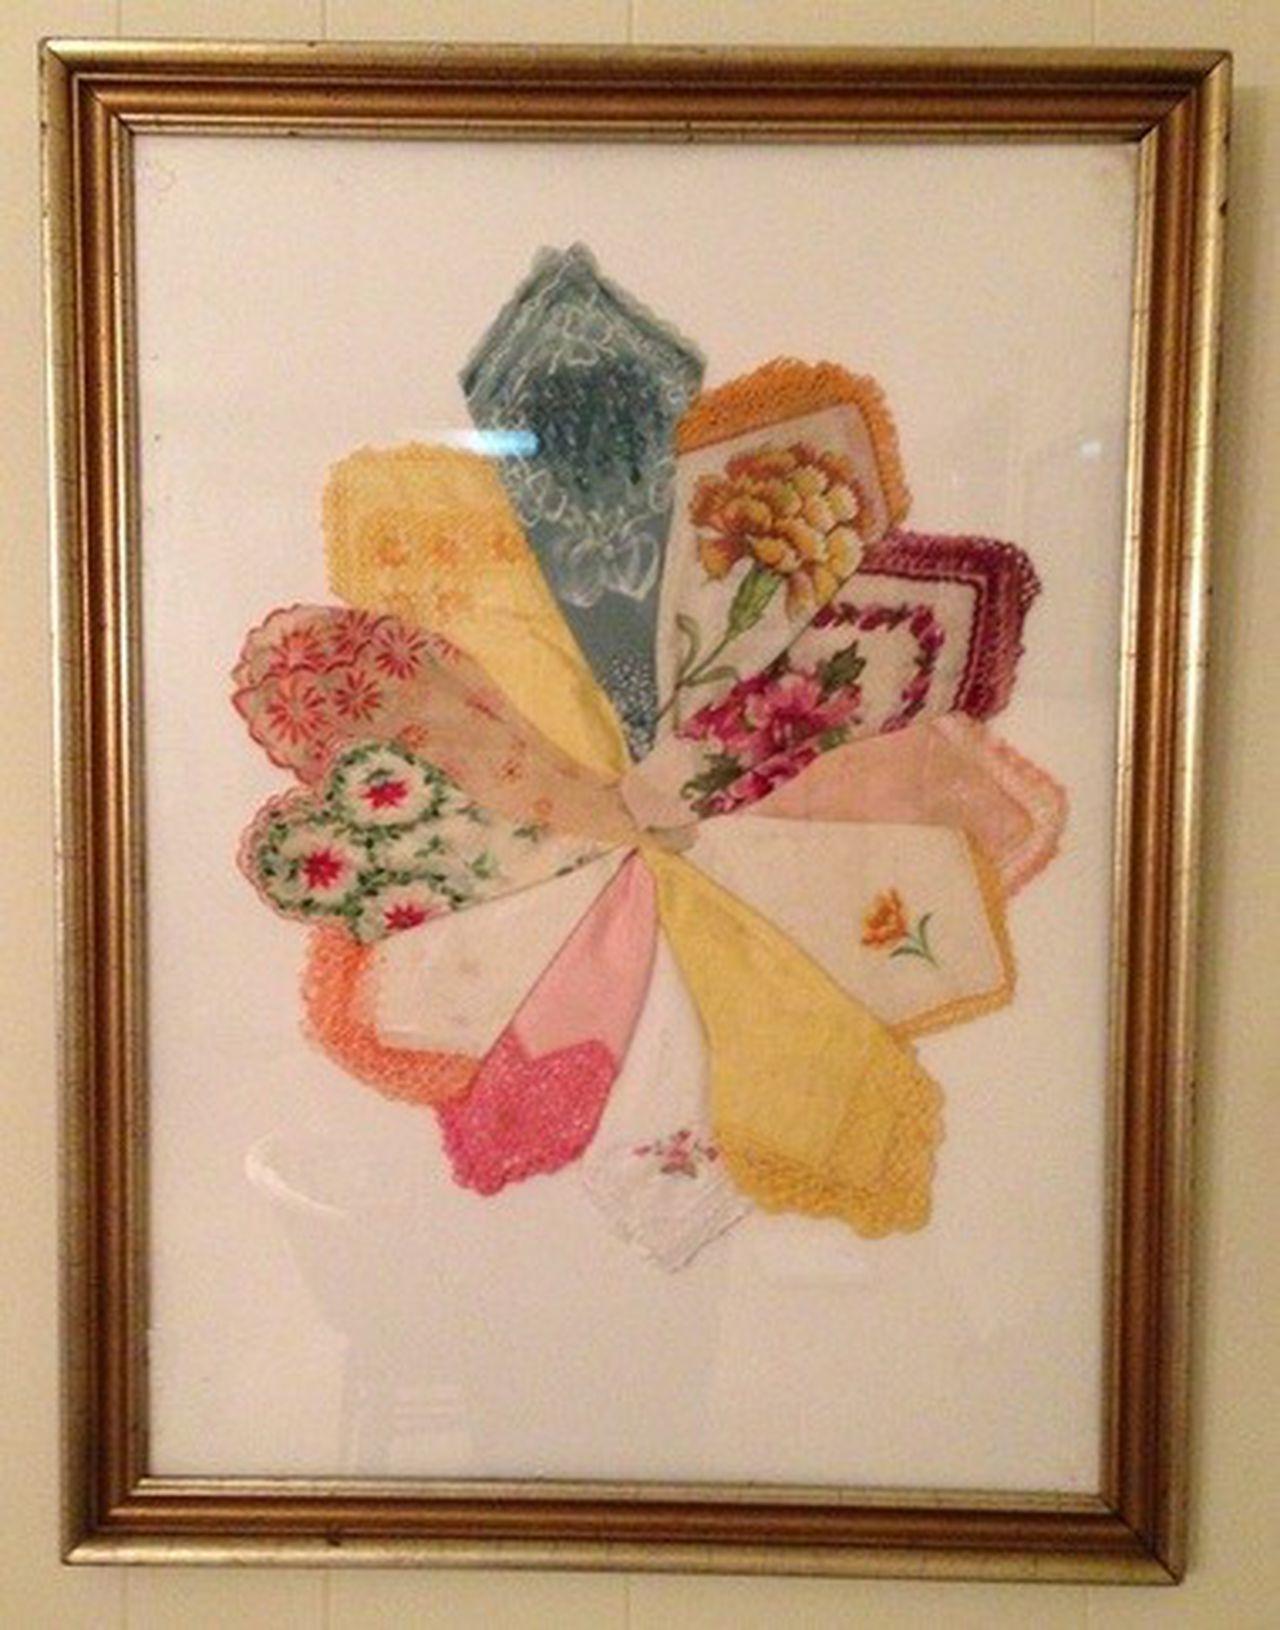 Frugal home decorating: Framing vintage handkerchiefs